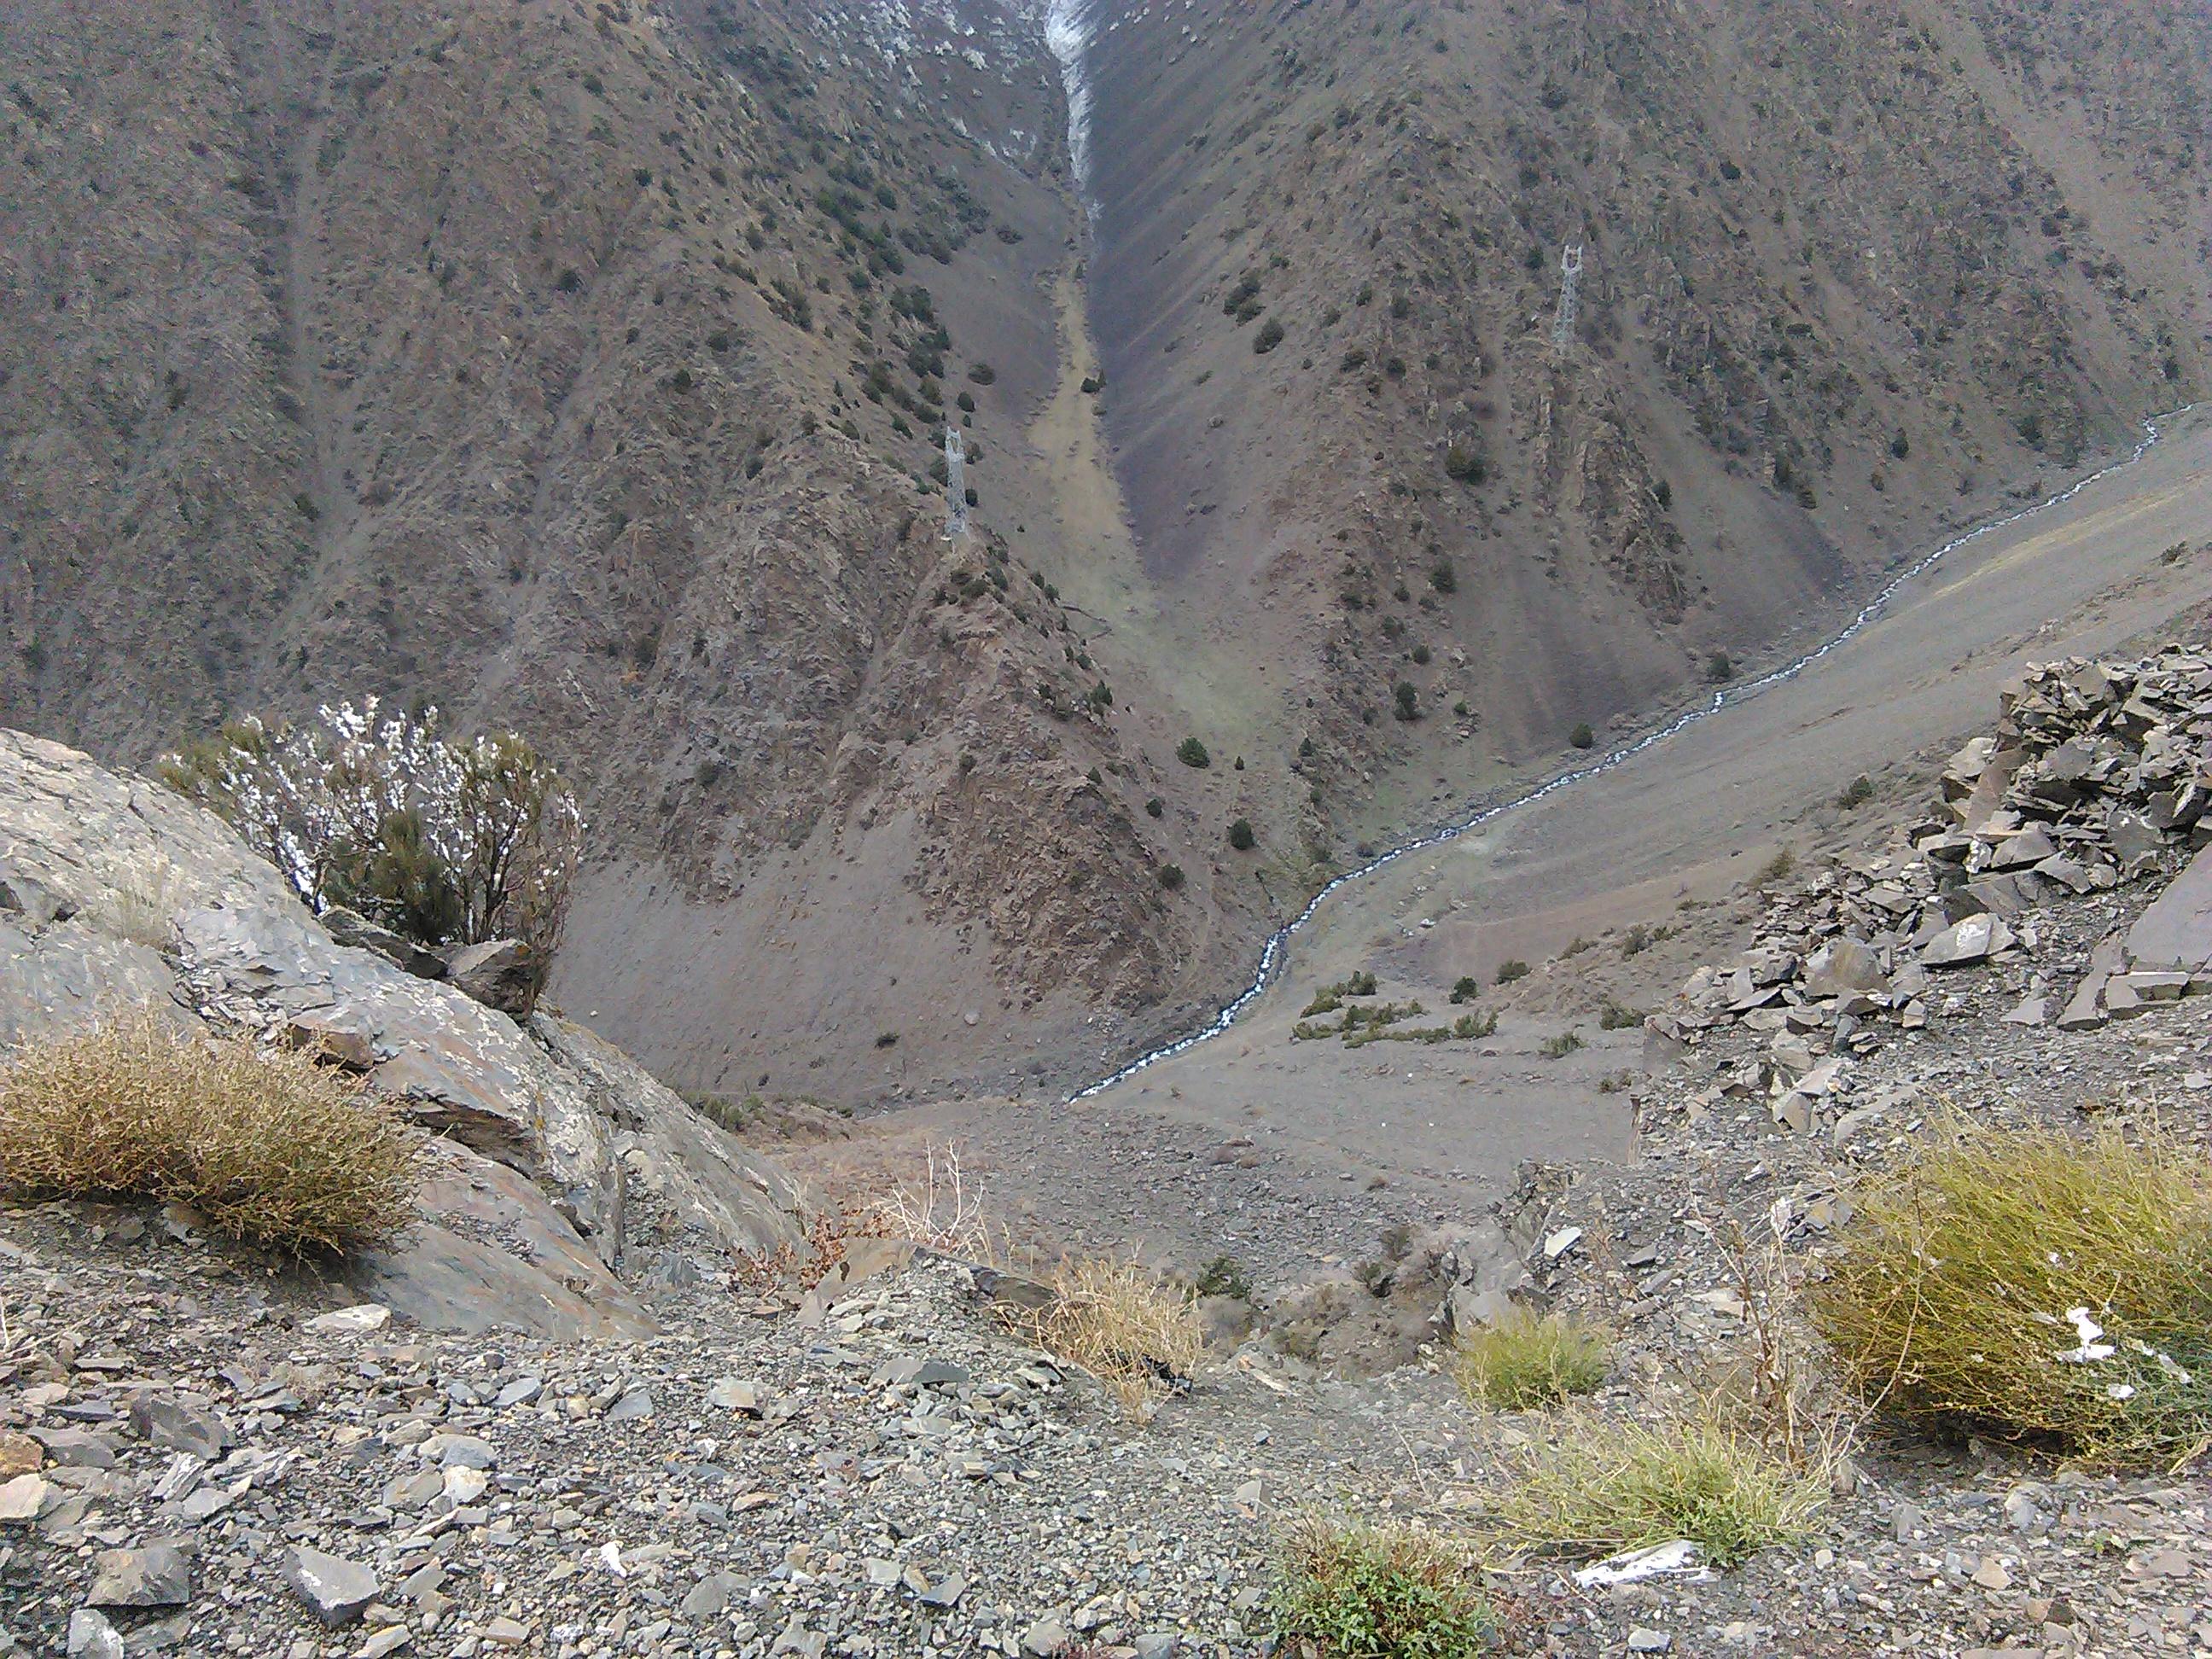 фото перевала в таджикистане делитесь друзьями будьте